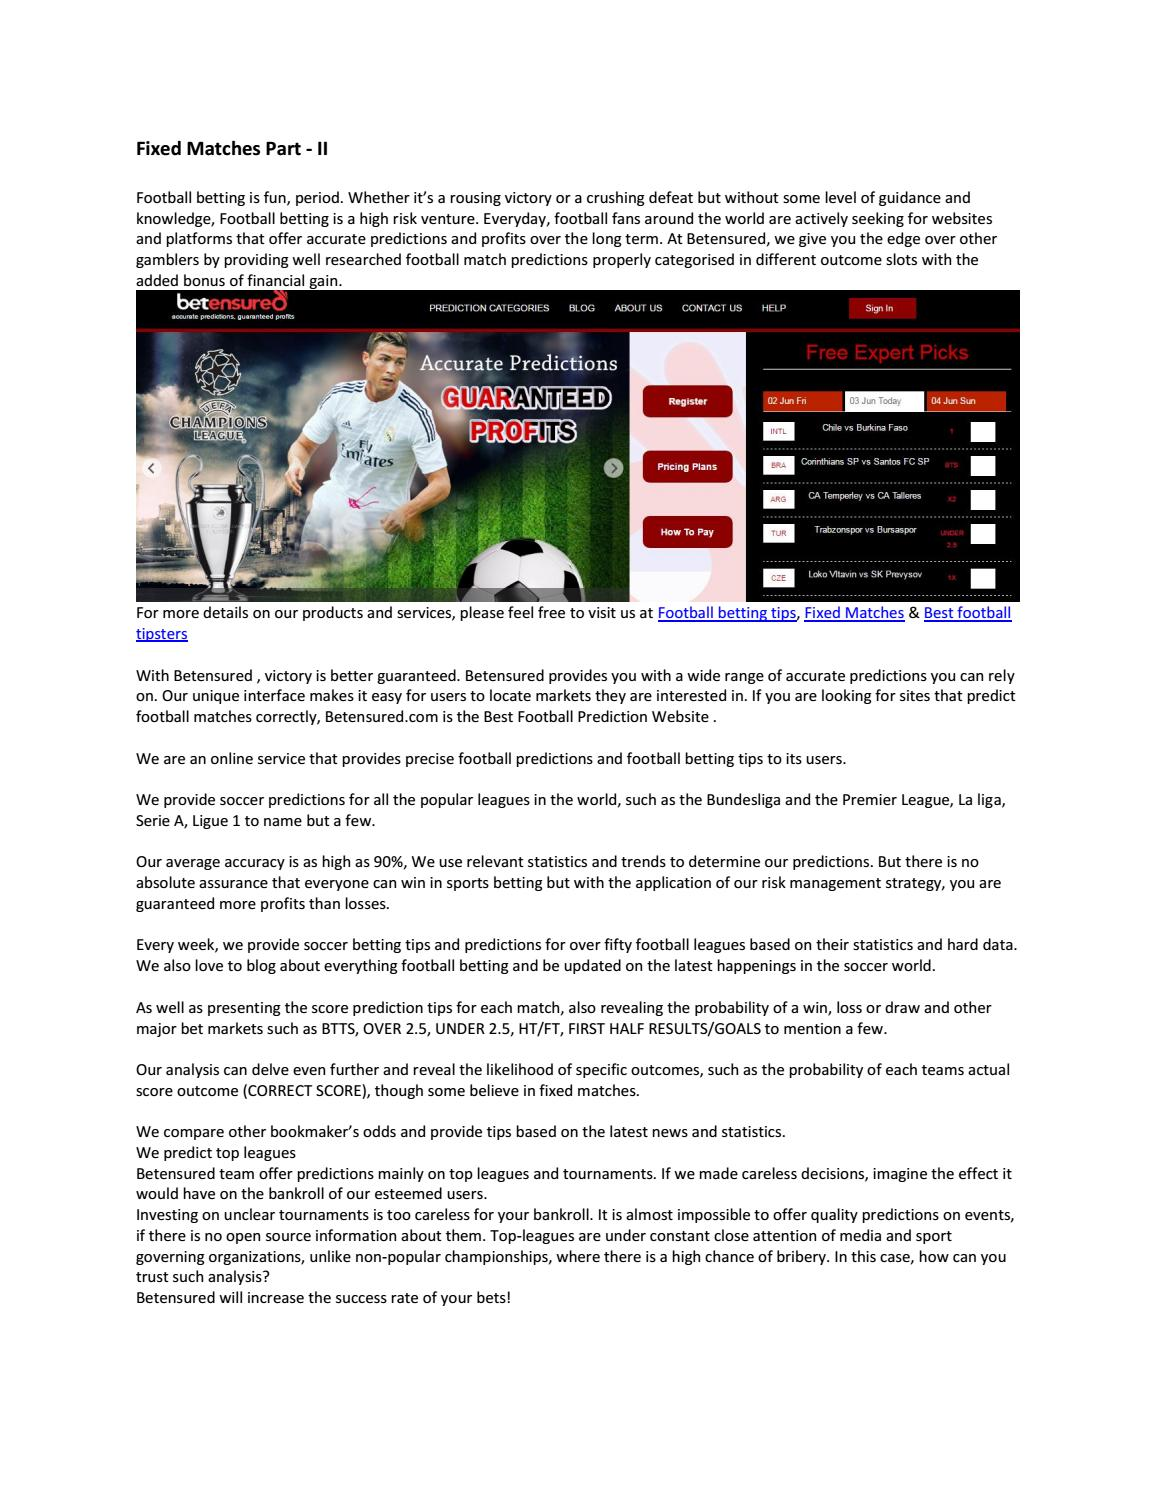 Fixed matches part ii by betensured - issuu